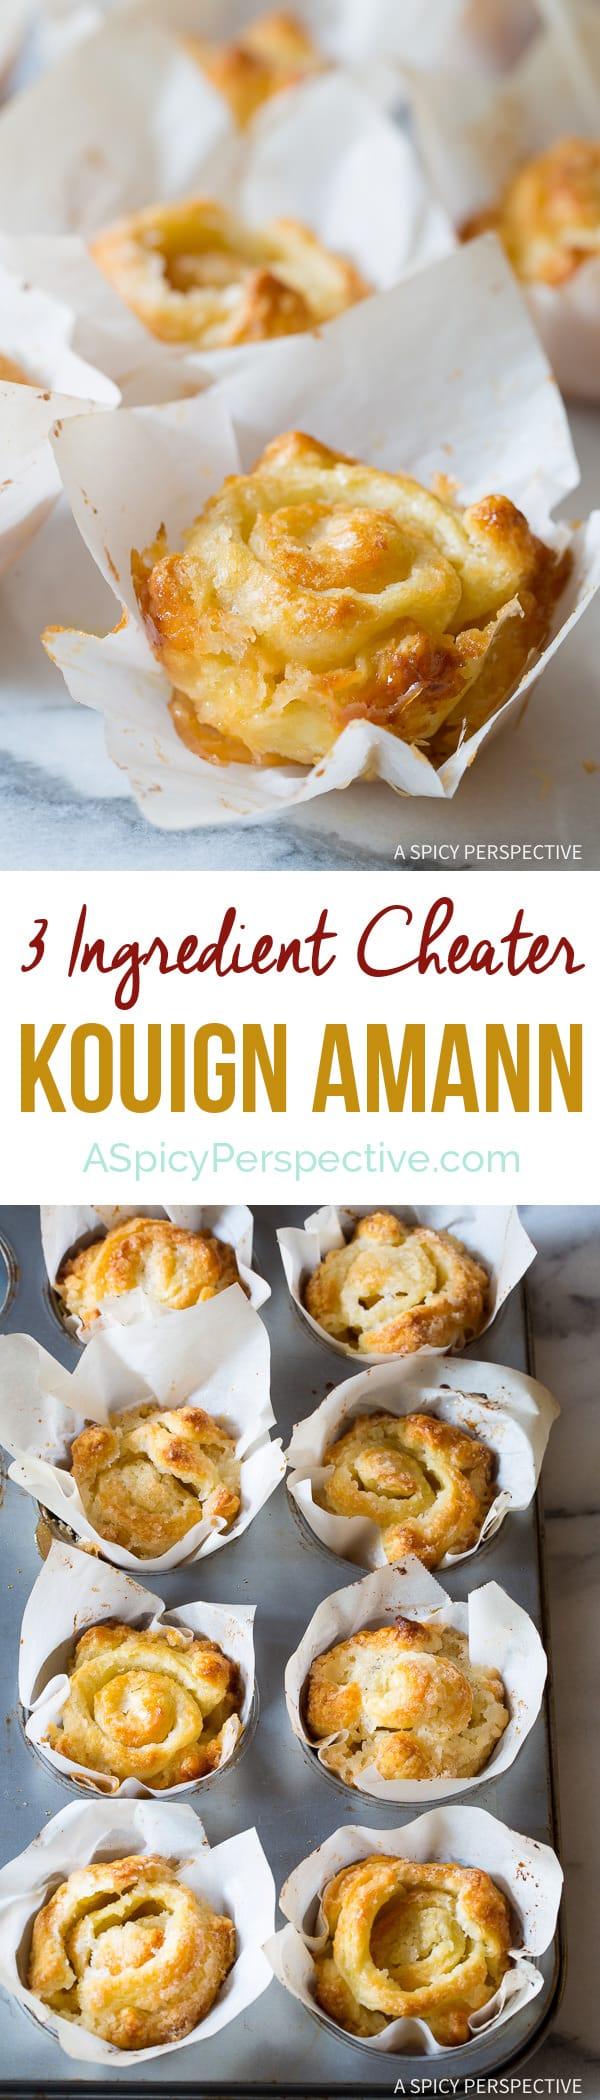 "Fabulous 3-Ingredient ""Cheater"" Kouign Amann Recipe on ASpicyPerspective.com"